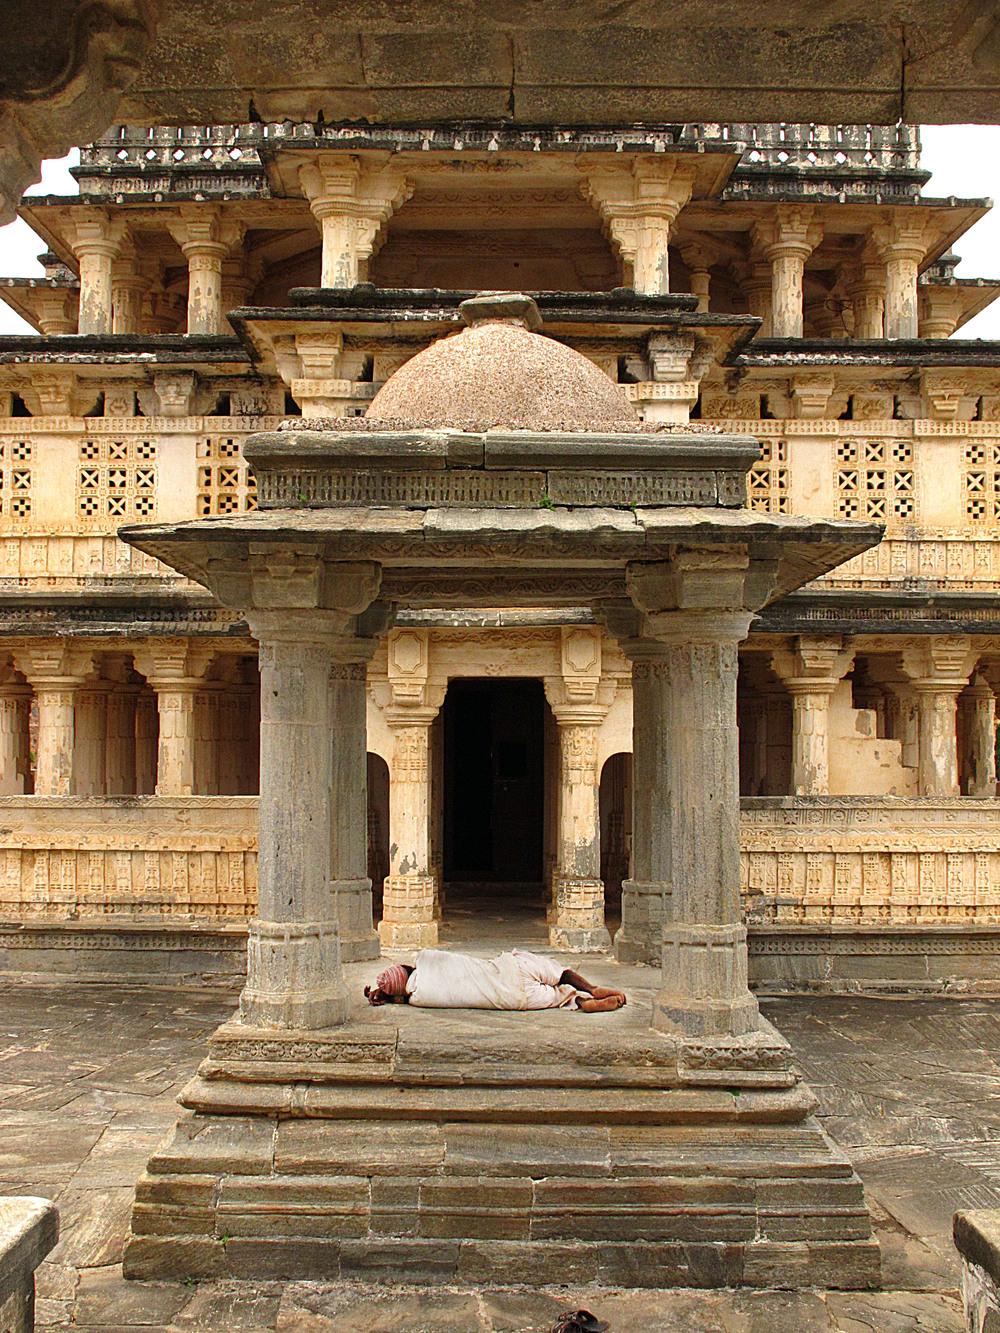 Kumbhalgar, India